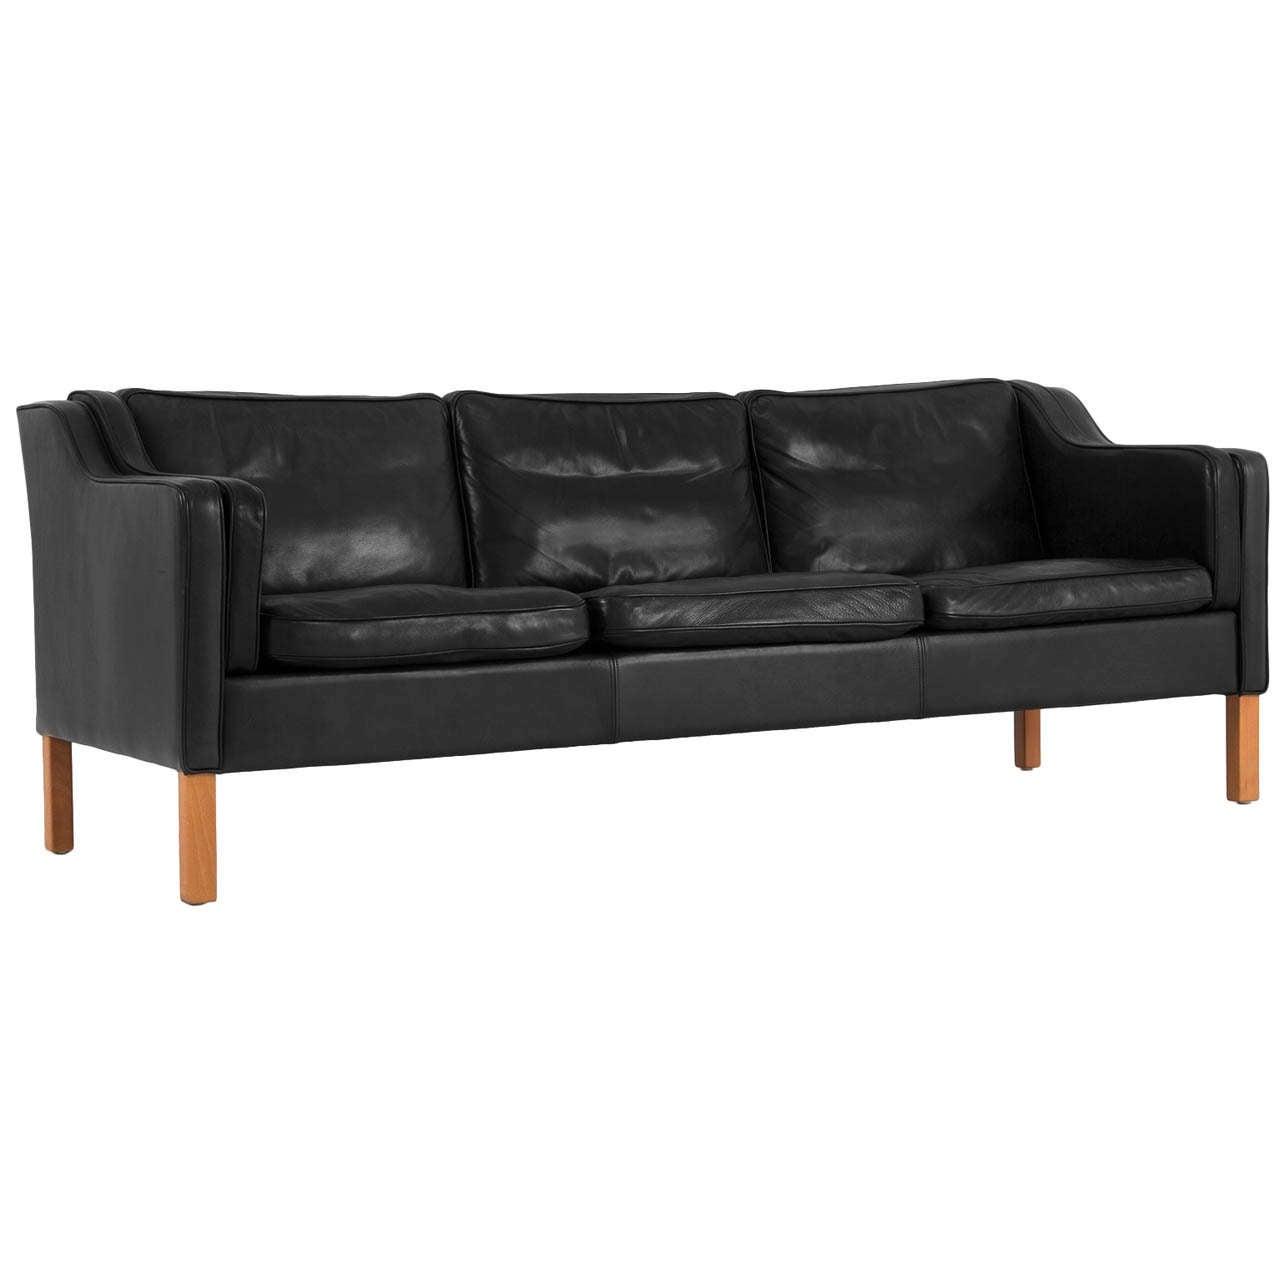 Danish Black Leather Sofa For Sale At 1stdibs